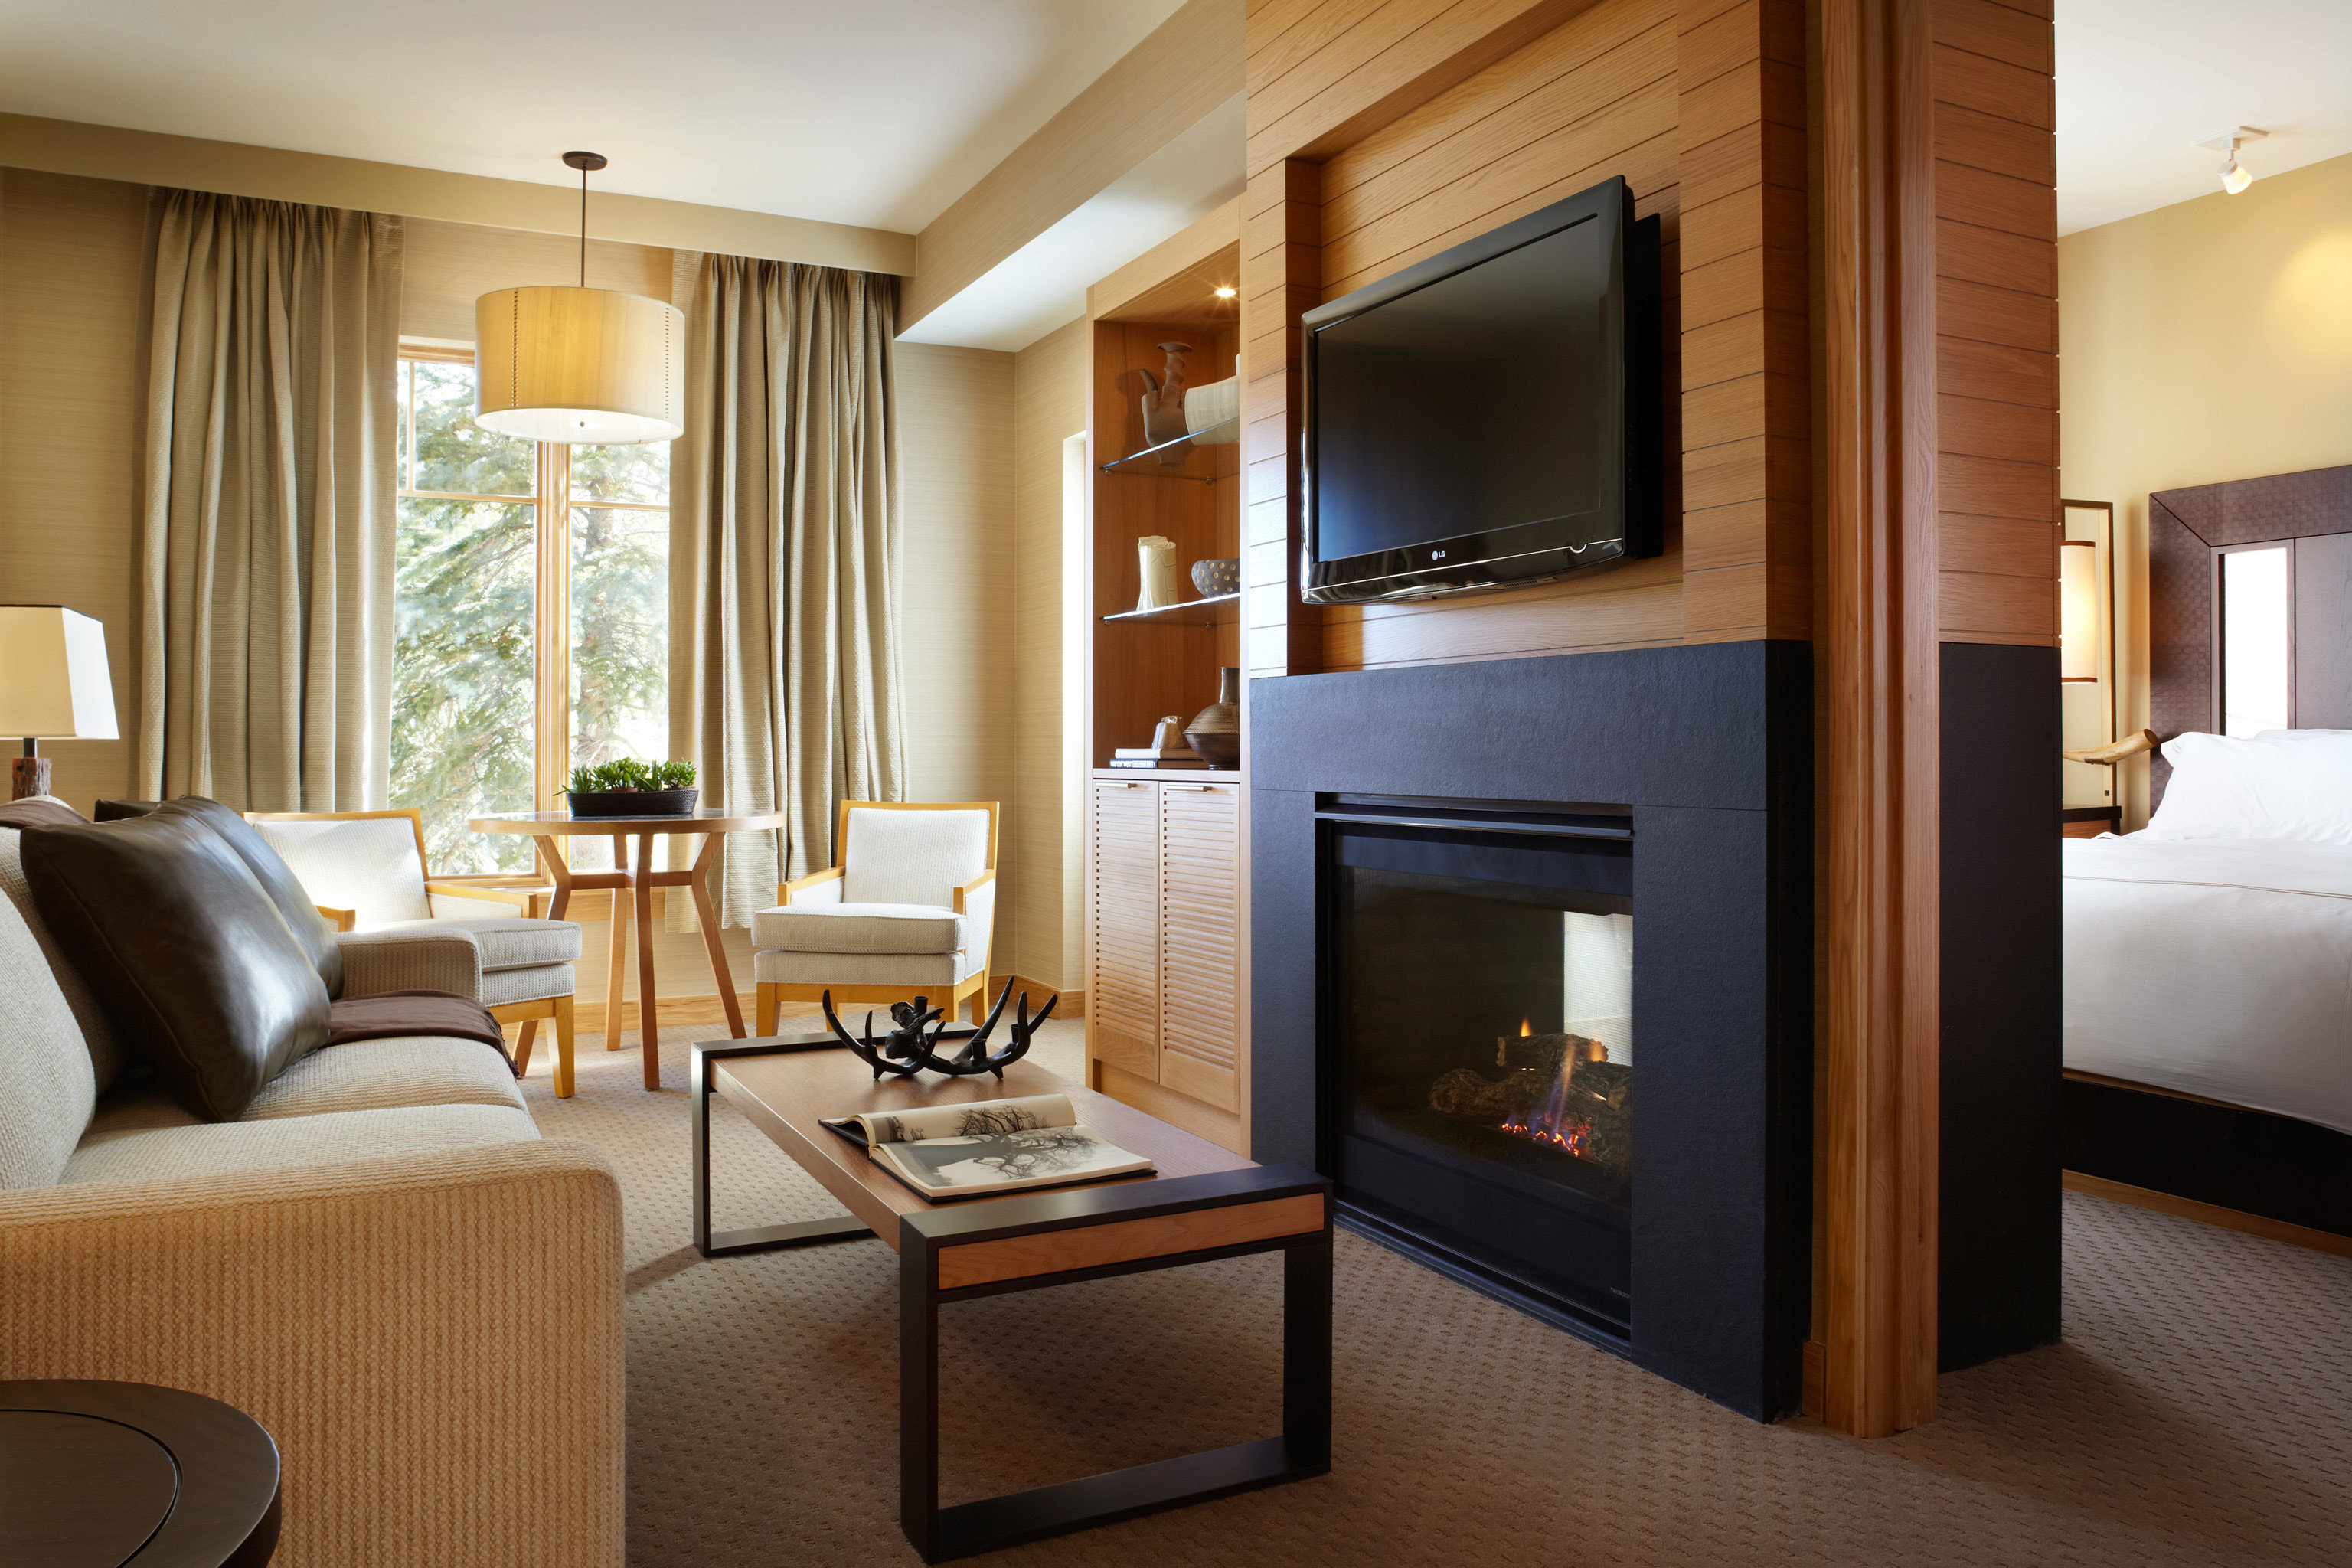 Bedroom Fireplace Luxury property living room home Suite condominium hardwood